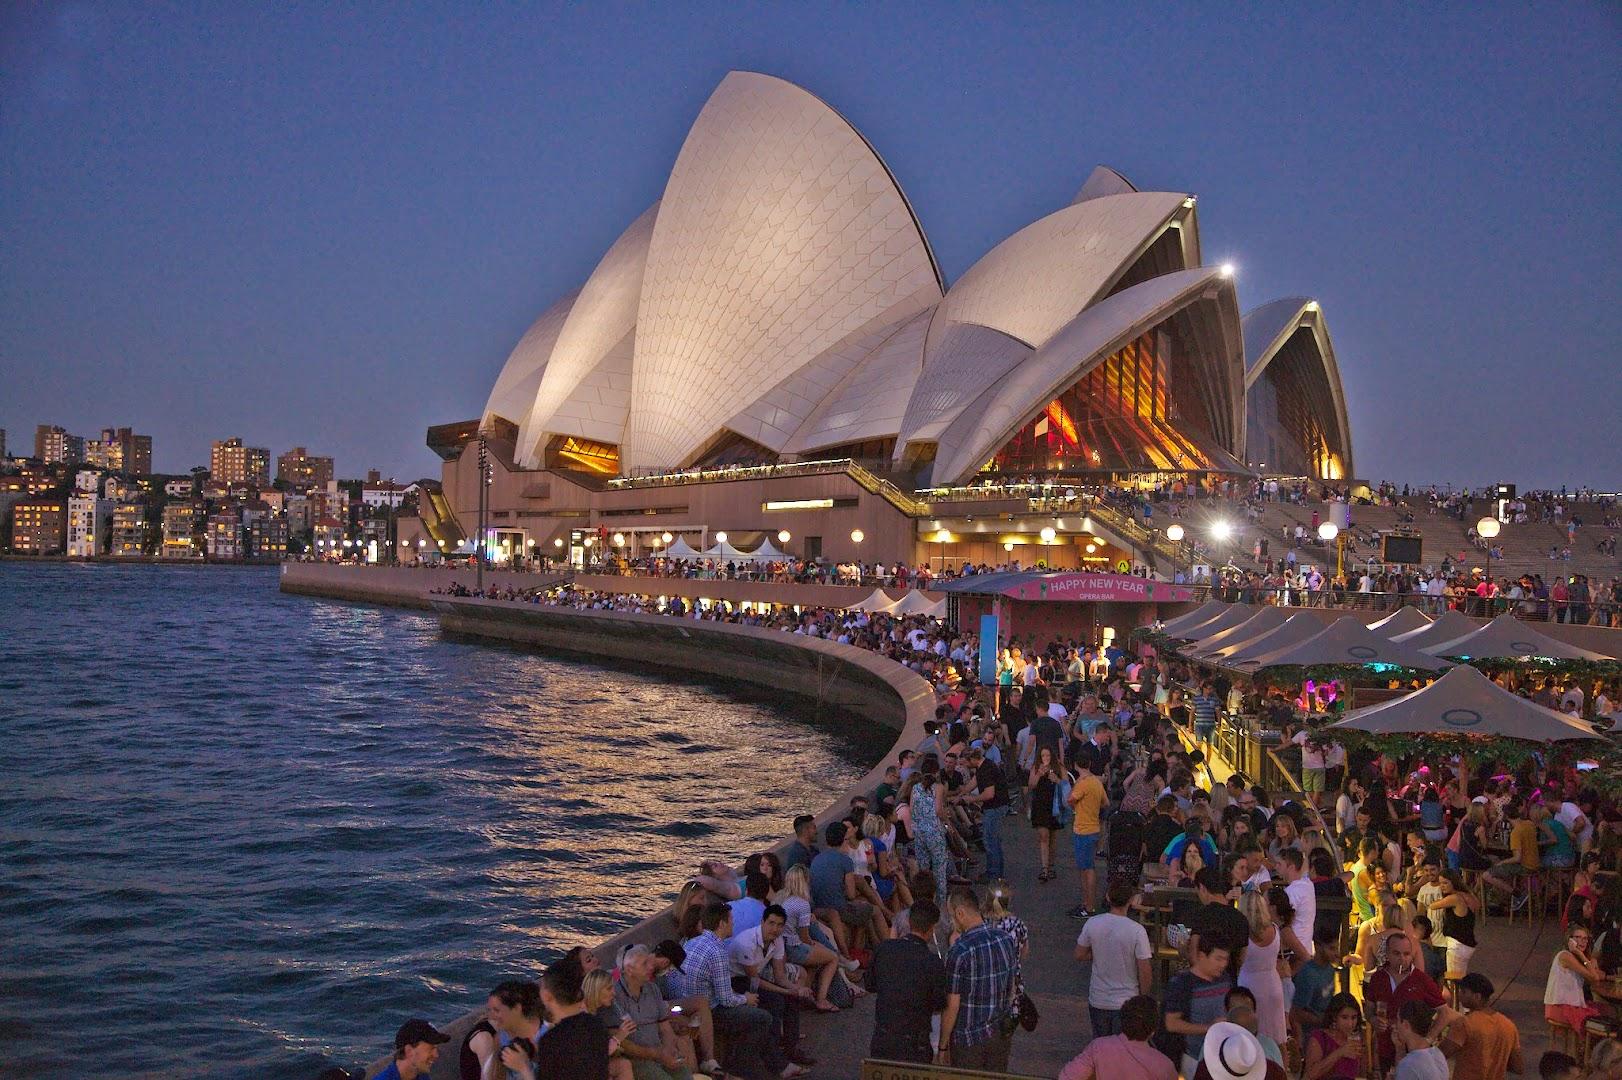 Sydney Opera house peninsula gets busy by night